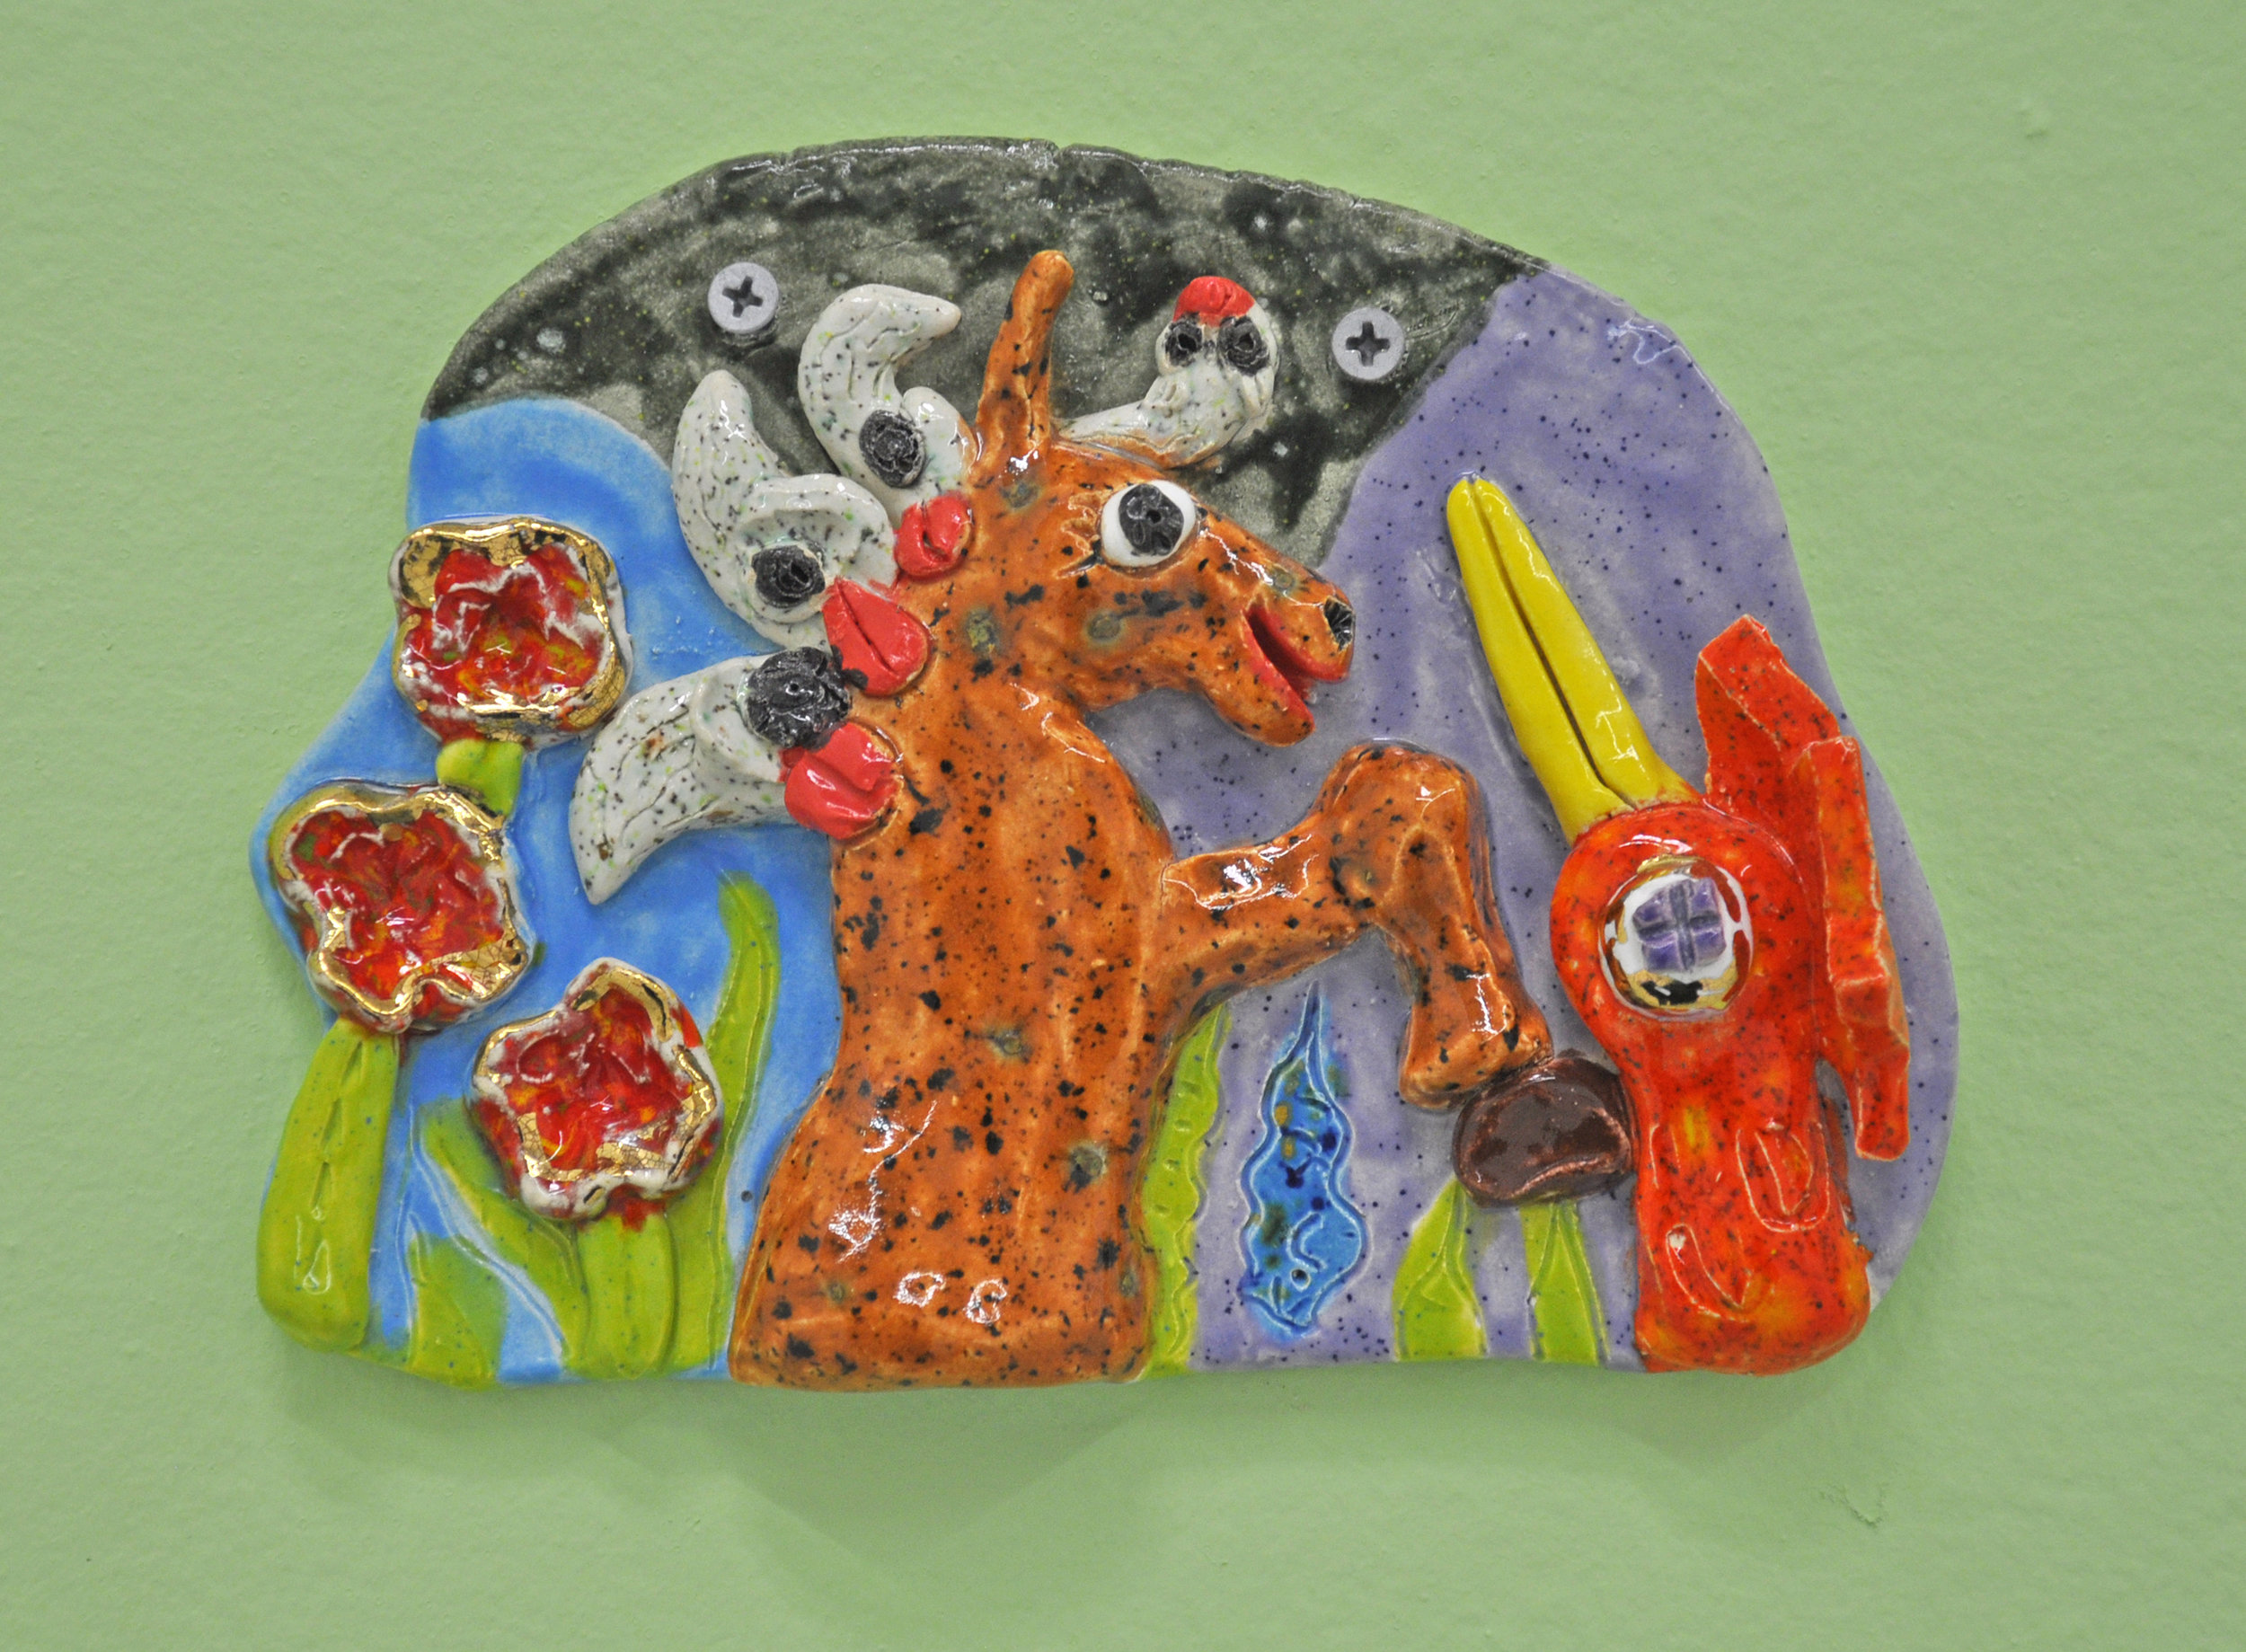 "Maija Peeples-Bright, ""Foal and Flying Friend"", glazed ceramic, 5 1/2 x 1/2 x 7 1/2 in, 2010"